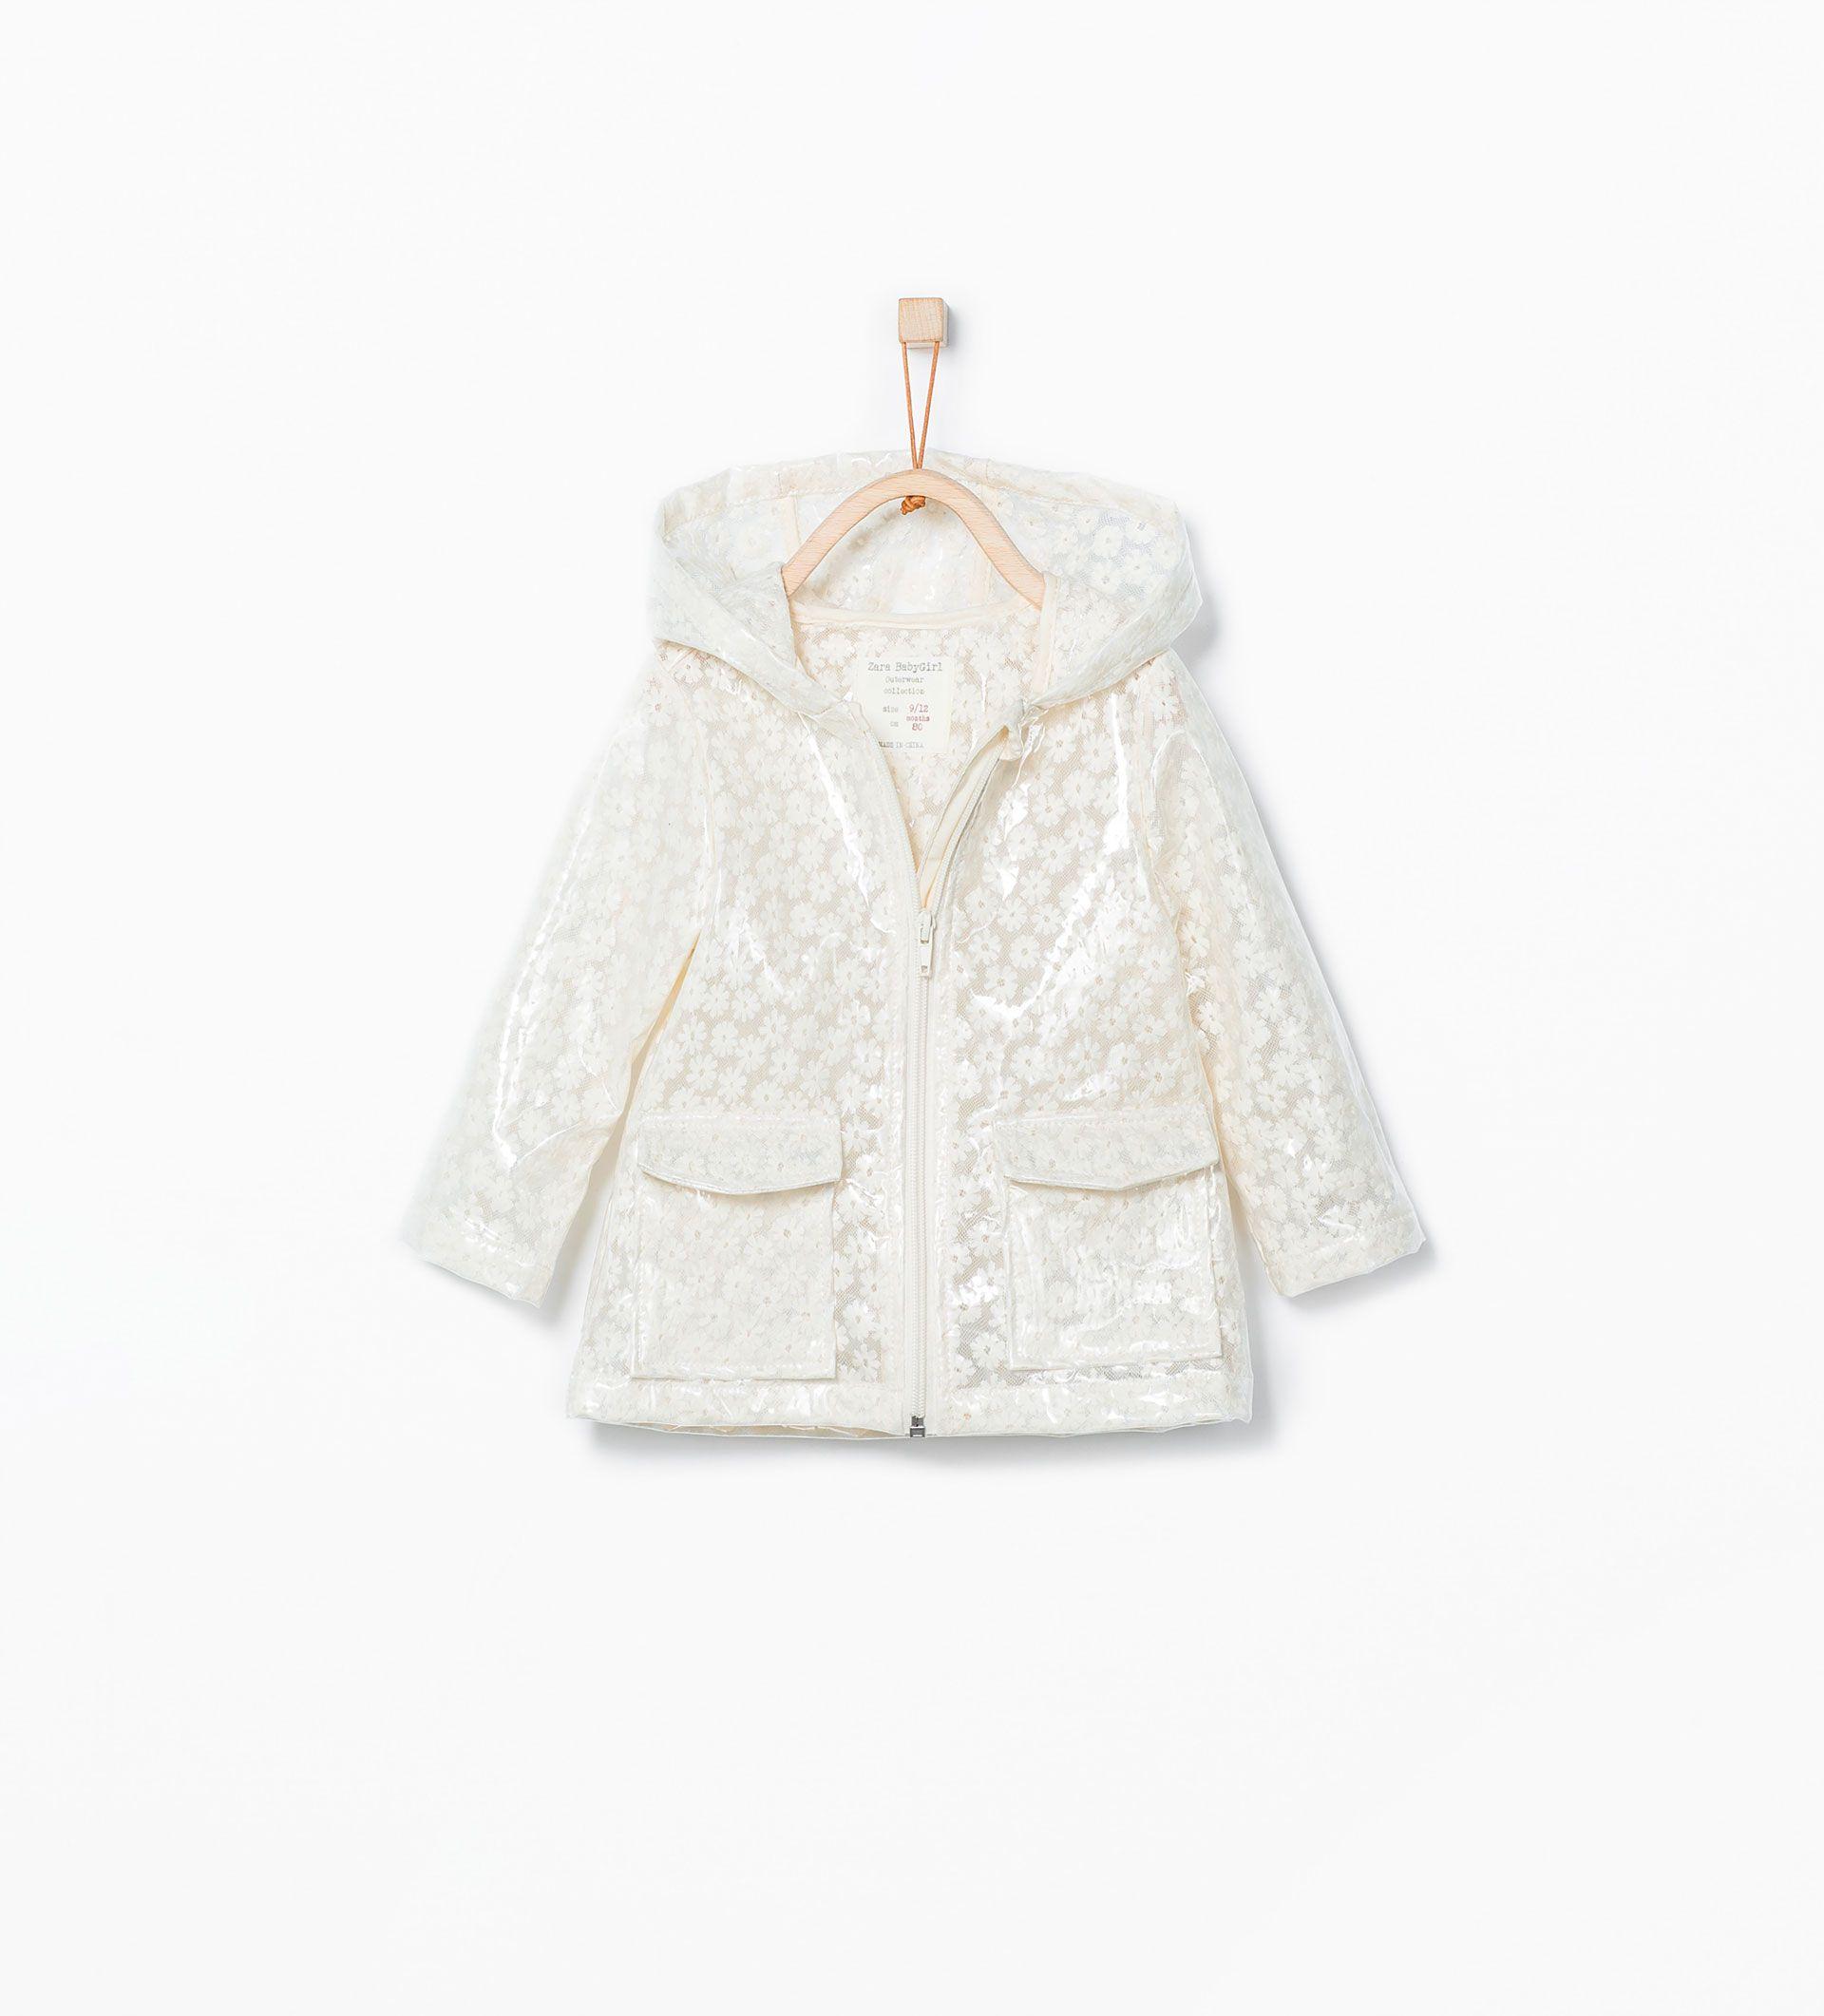 Transparente floral raincoat - Jackets - Baby girl (3 months - 3 years) - KIDS | ZARA Serbia